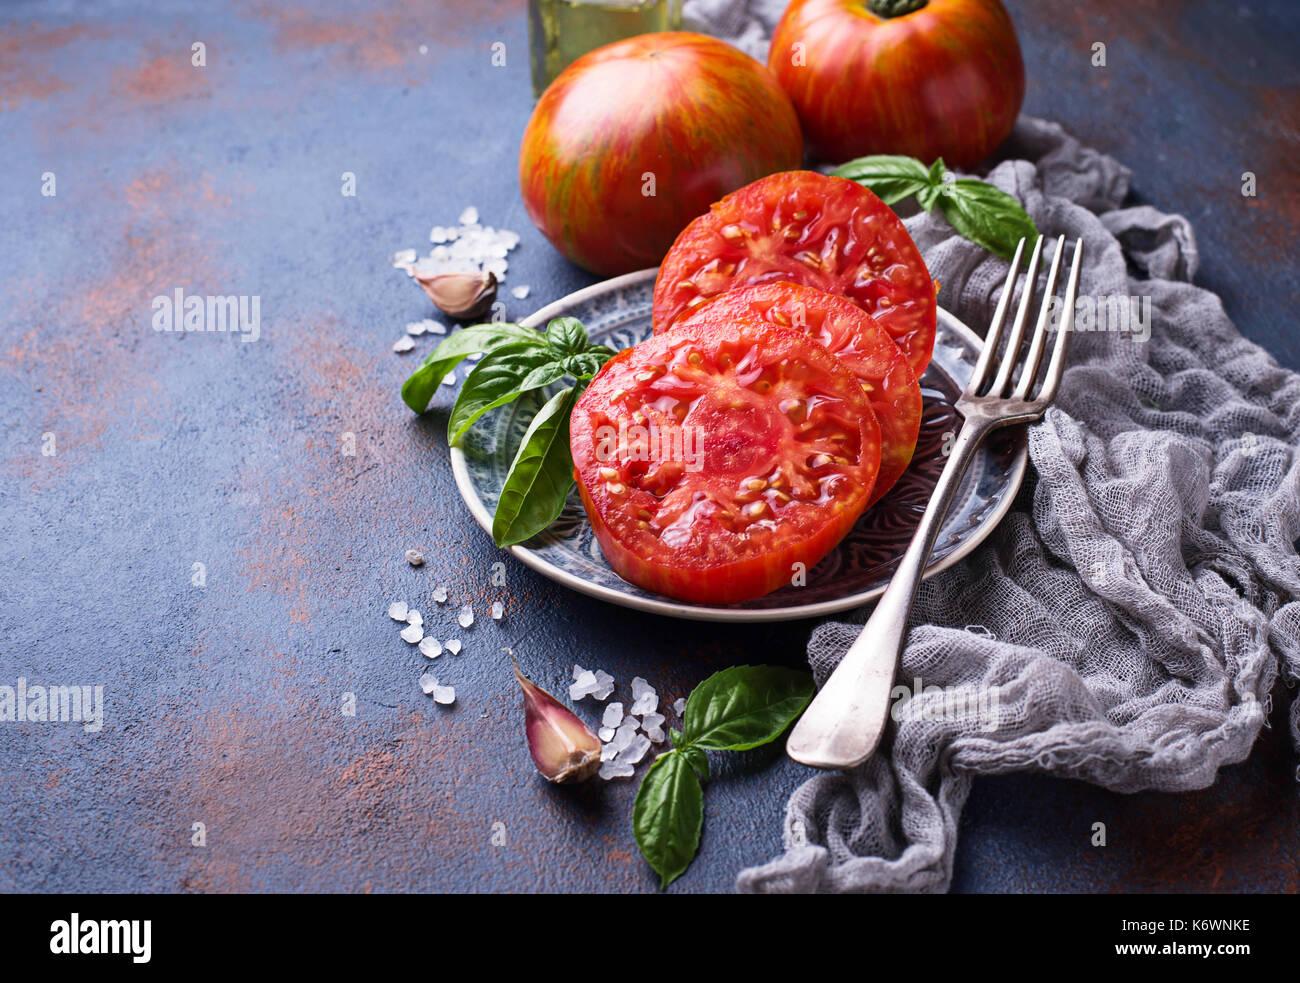 Sliced tomato on blue rusty background - Stock Image